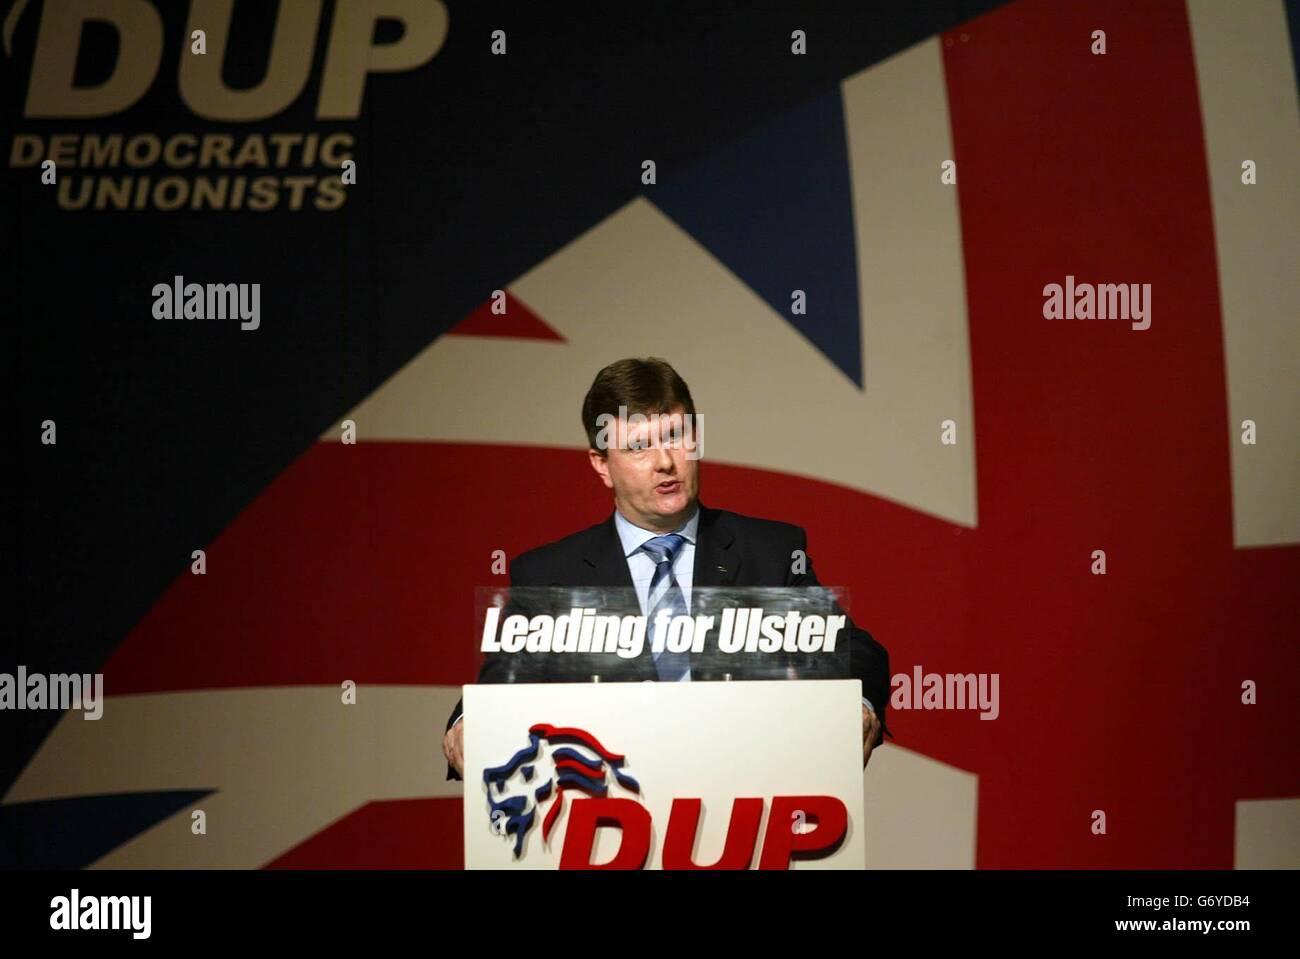 Democratic Unionist Party AGM - Stock Image